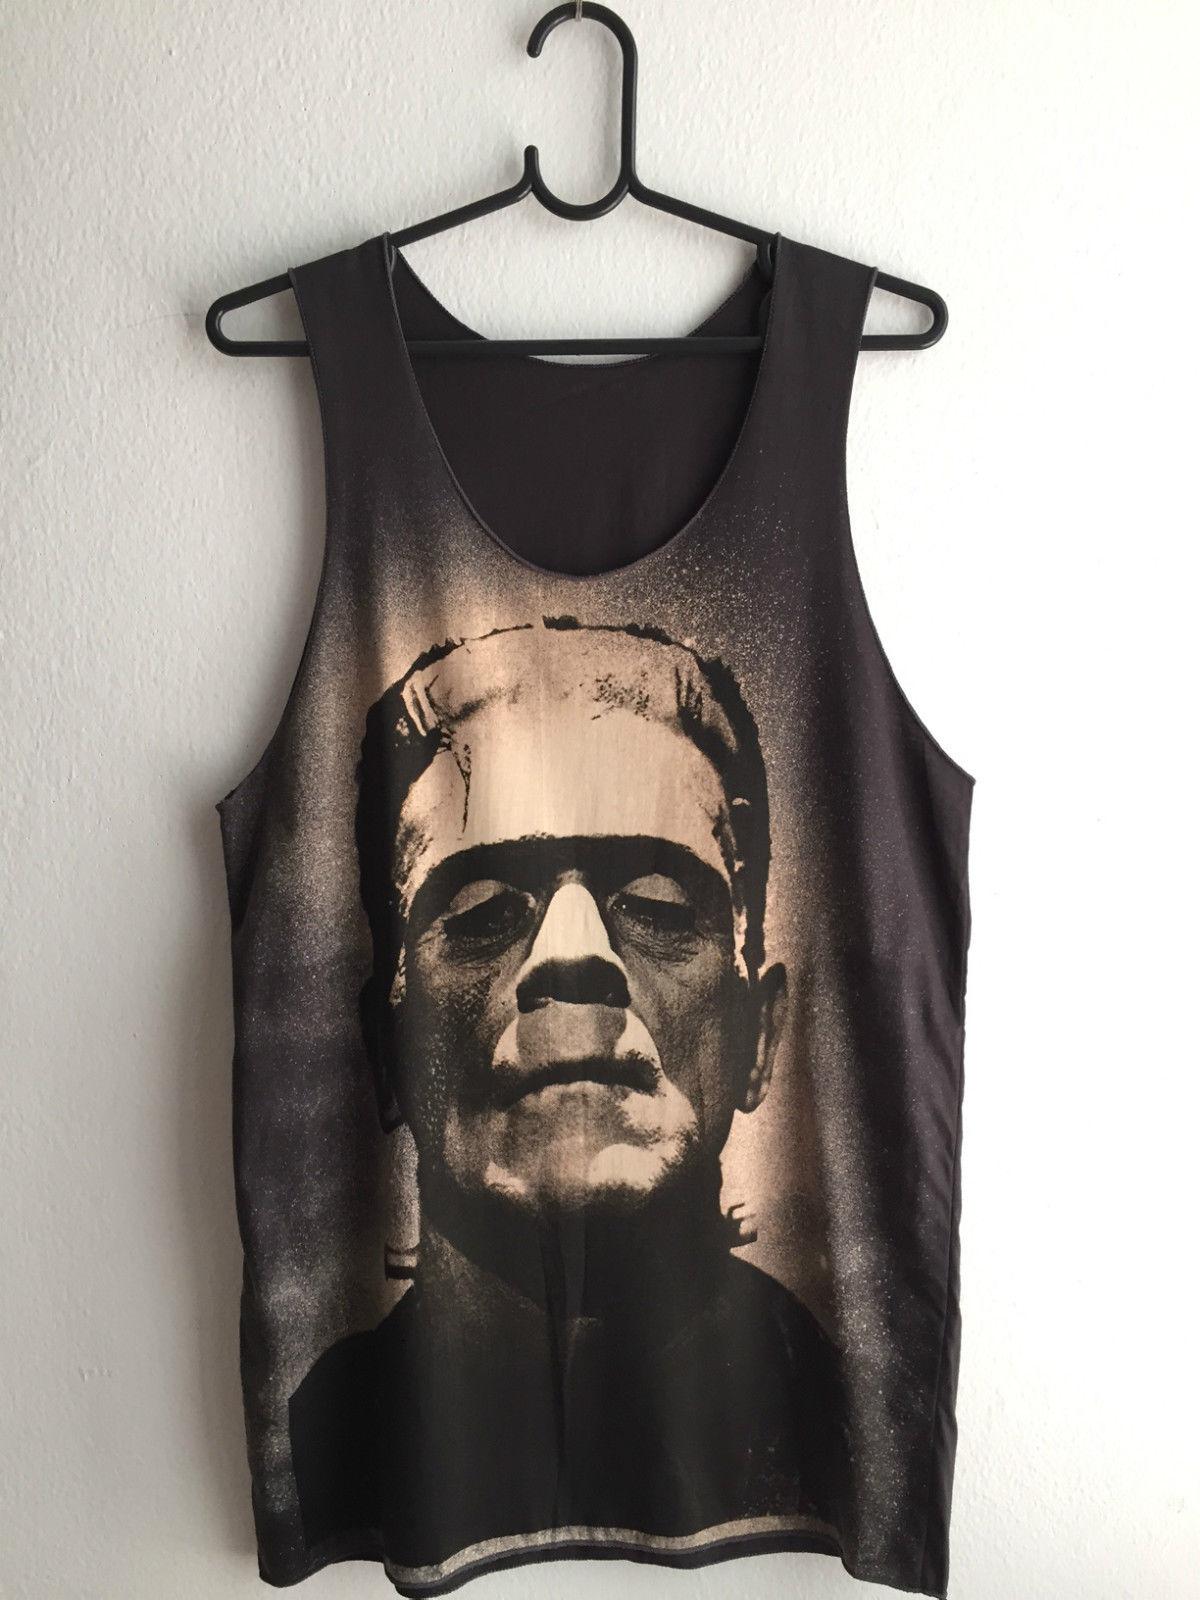 frankenstein_fashion_pop_indie_unisex_vest_tank_top_tanks_tops_and_camis_4.JPG